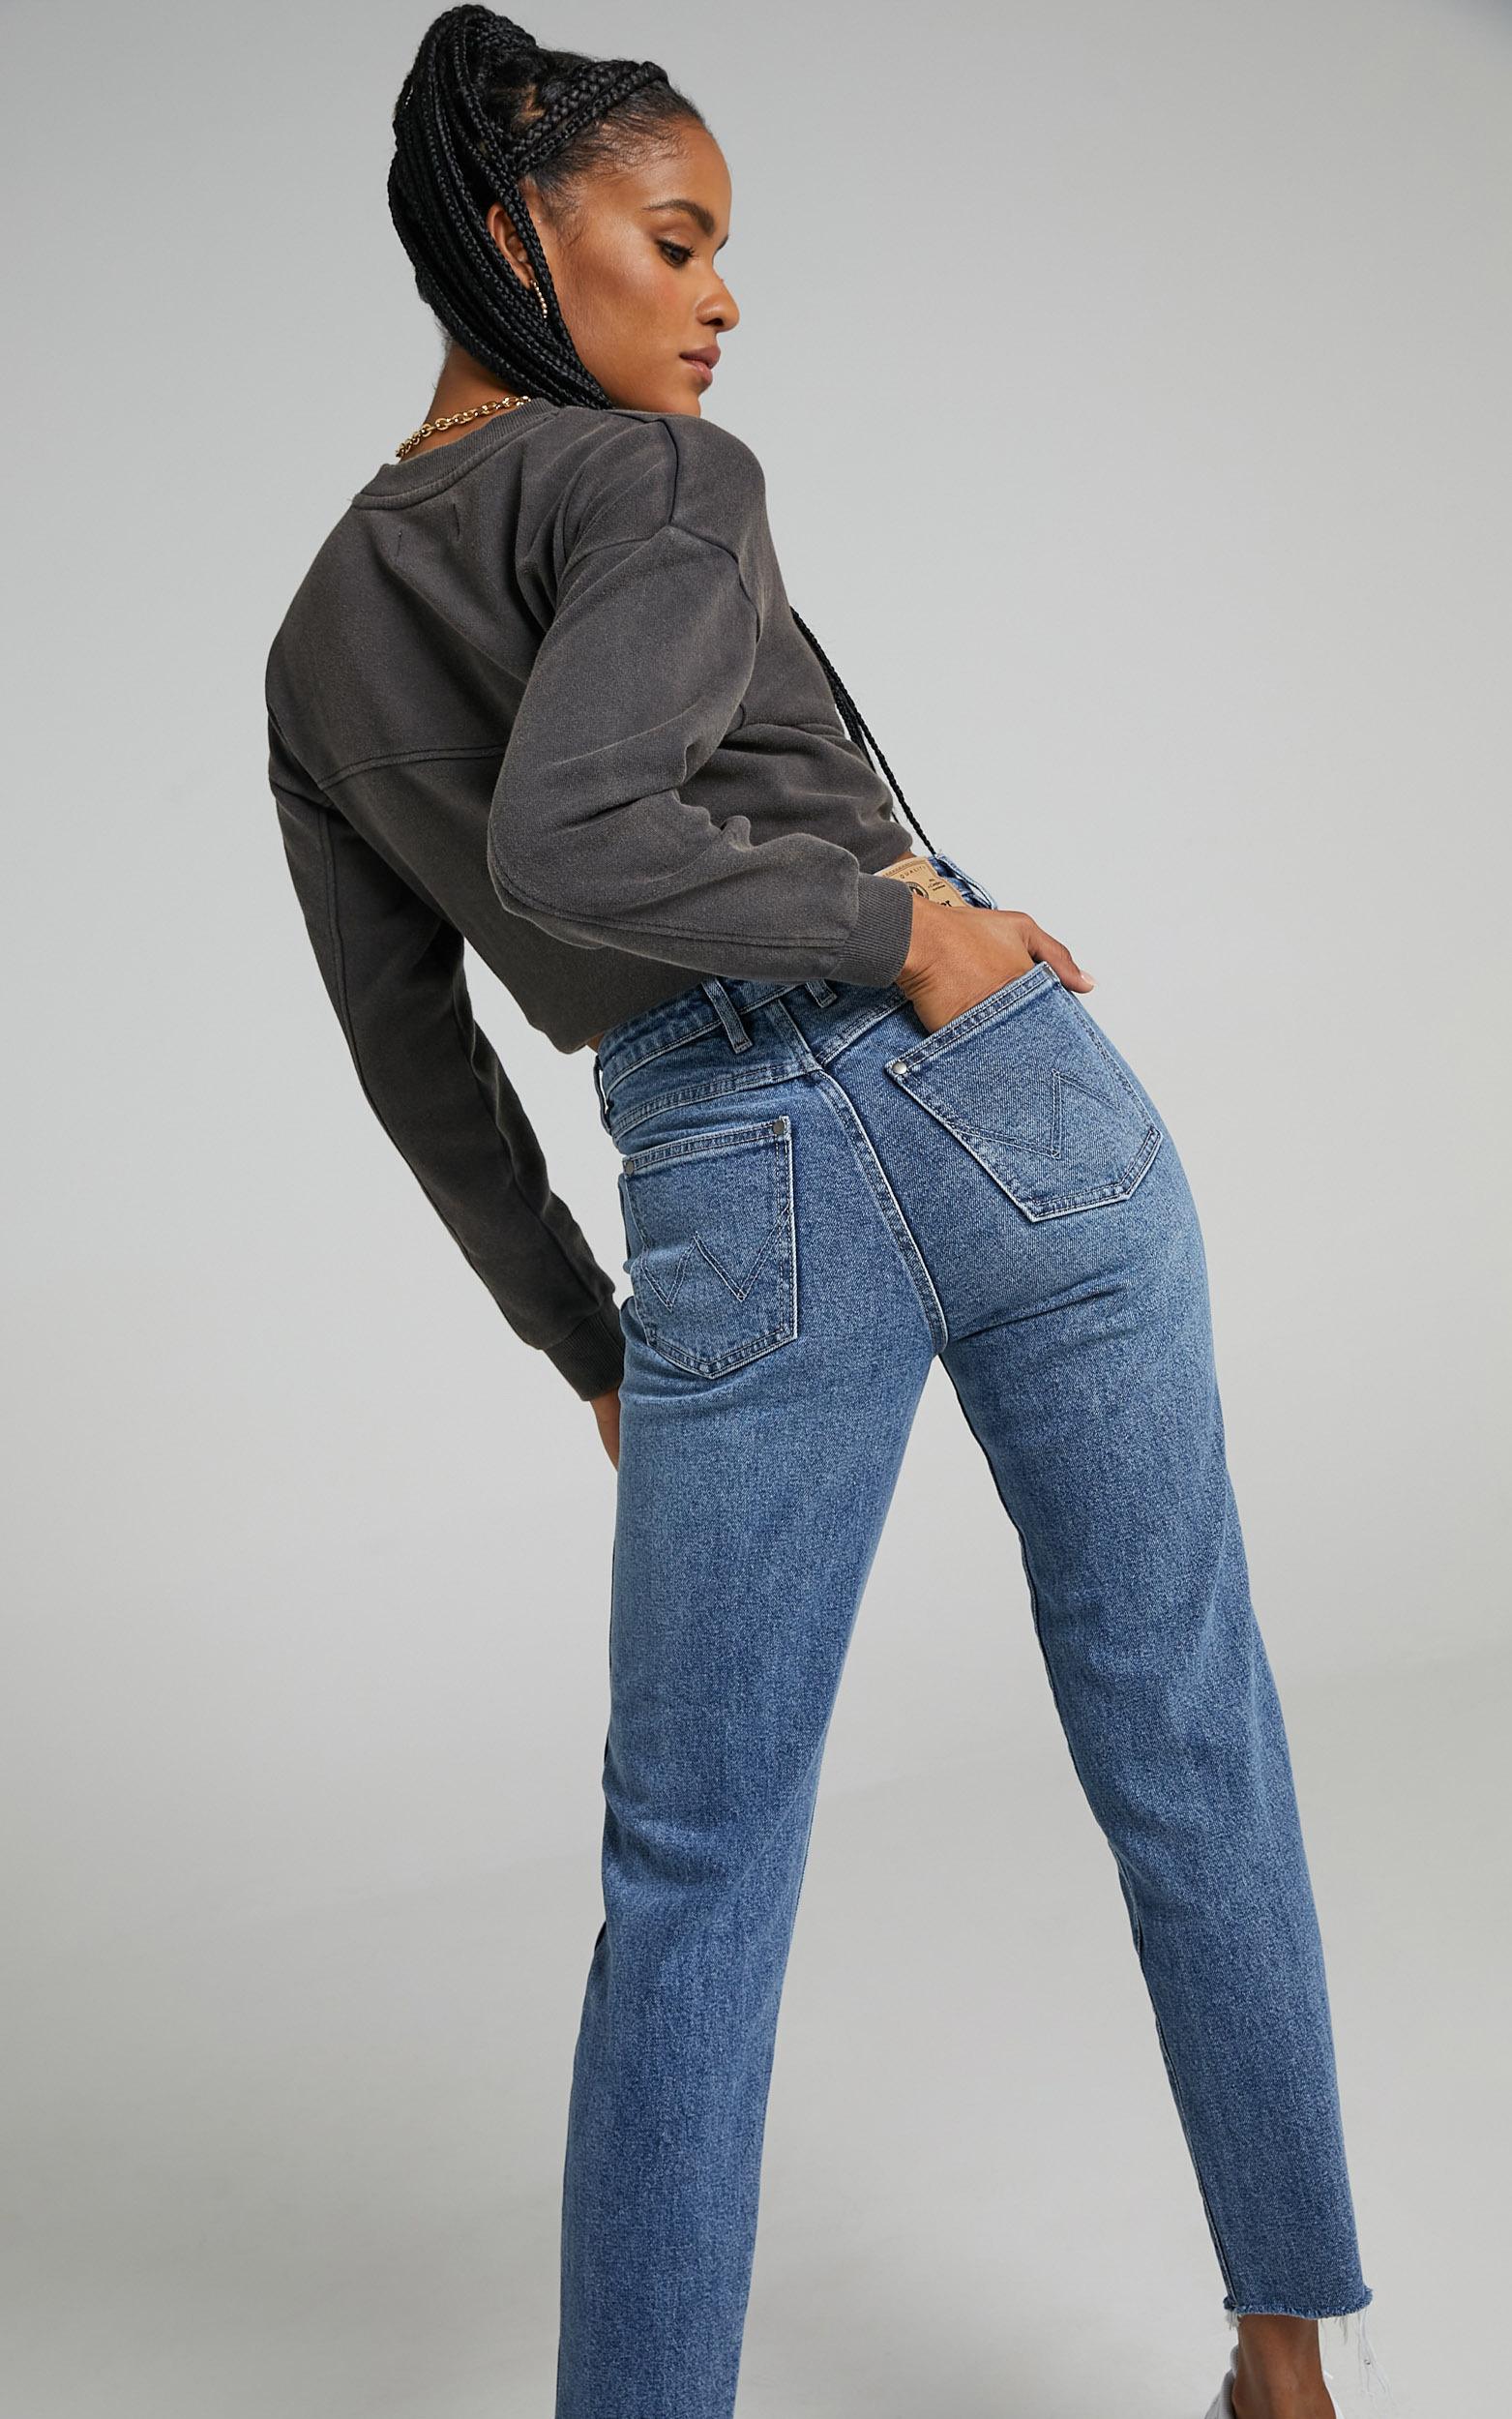 Wrangler - Drew Jeans in Heavy Dew - 06, BLU1, hi-res image number null